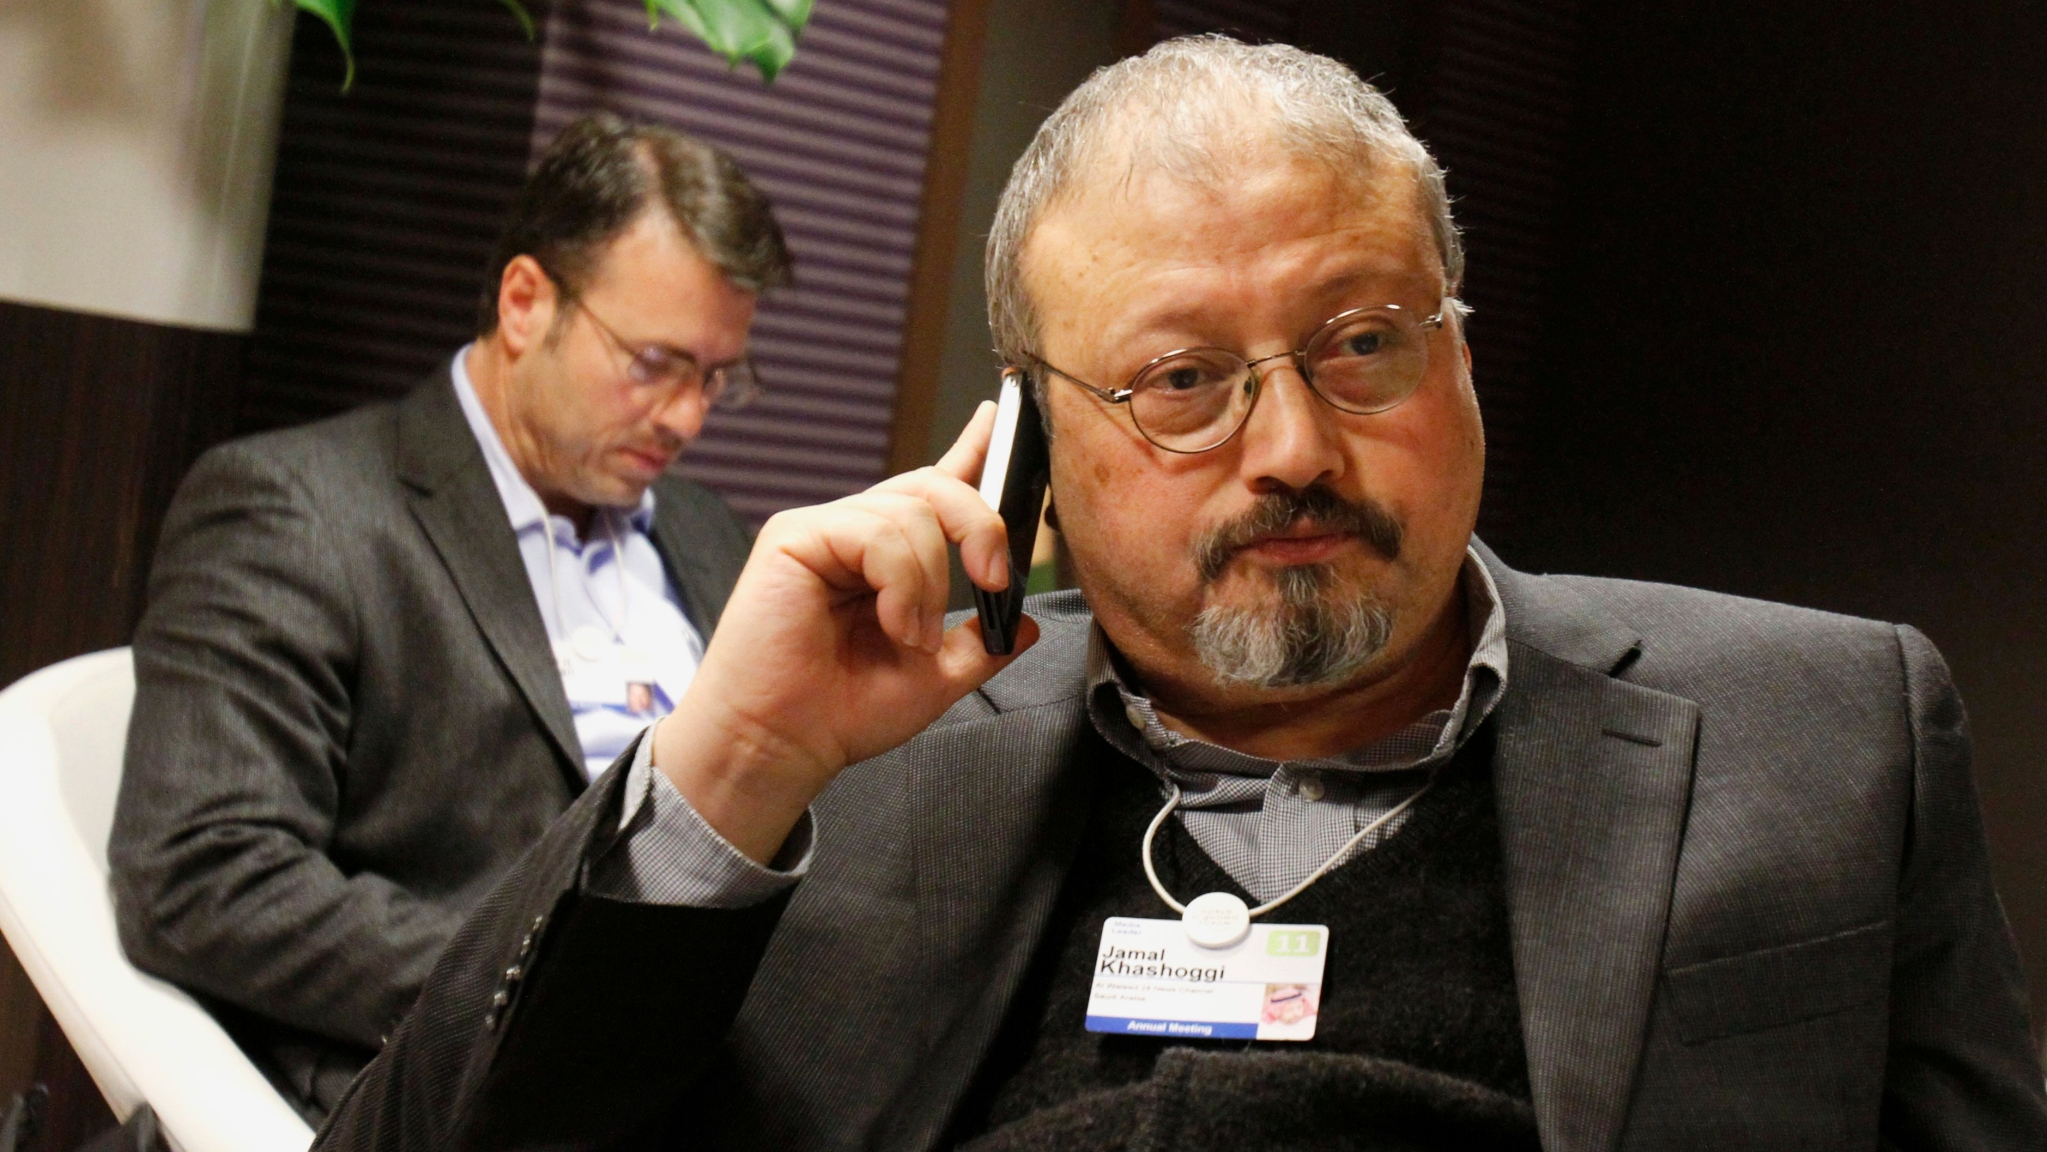 Saudi Arabia to Seek Death Penalty in Jamal Khashoggi Killing